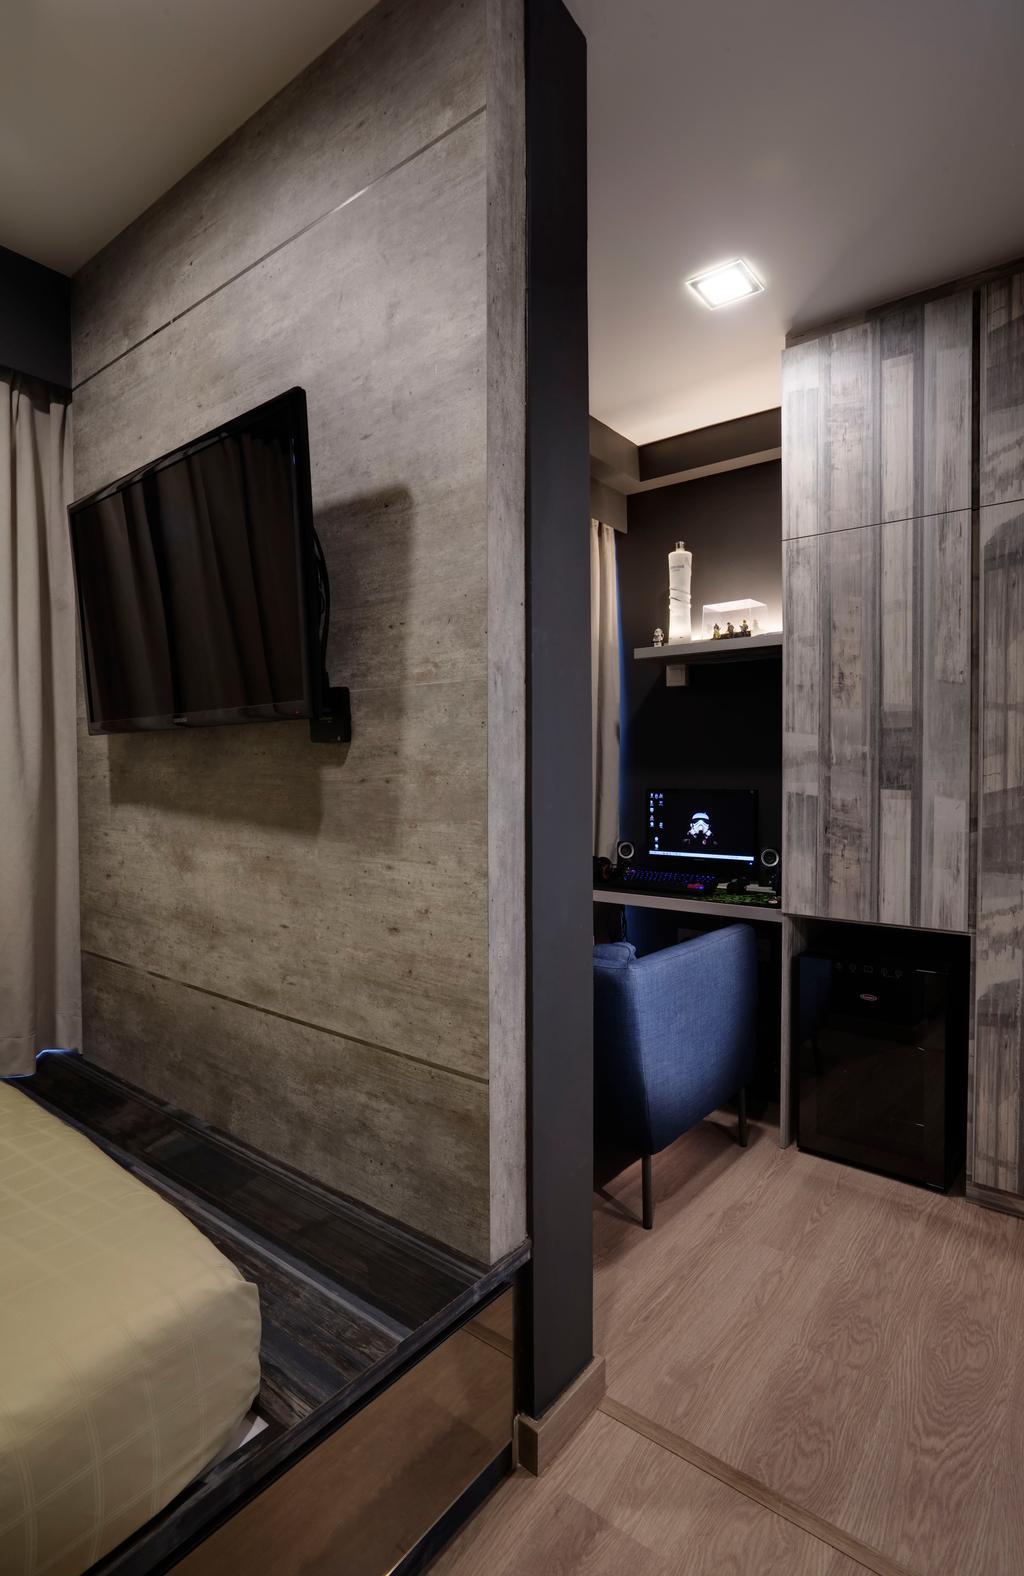 Contemporary, Condo, Bedroom, Austville Residences, Interior Designer, The Orange Cube, Feature Wall, Paltform, Wood Floor, Luggage, Suitcase